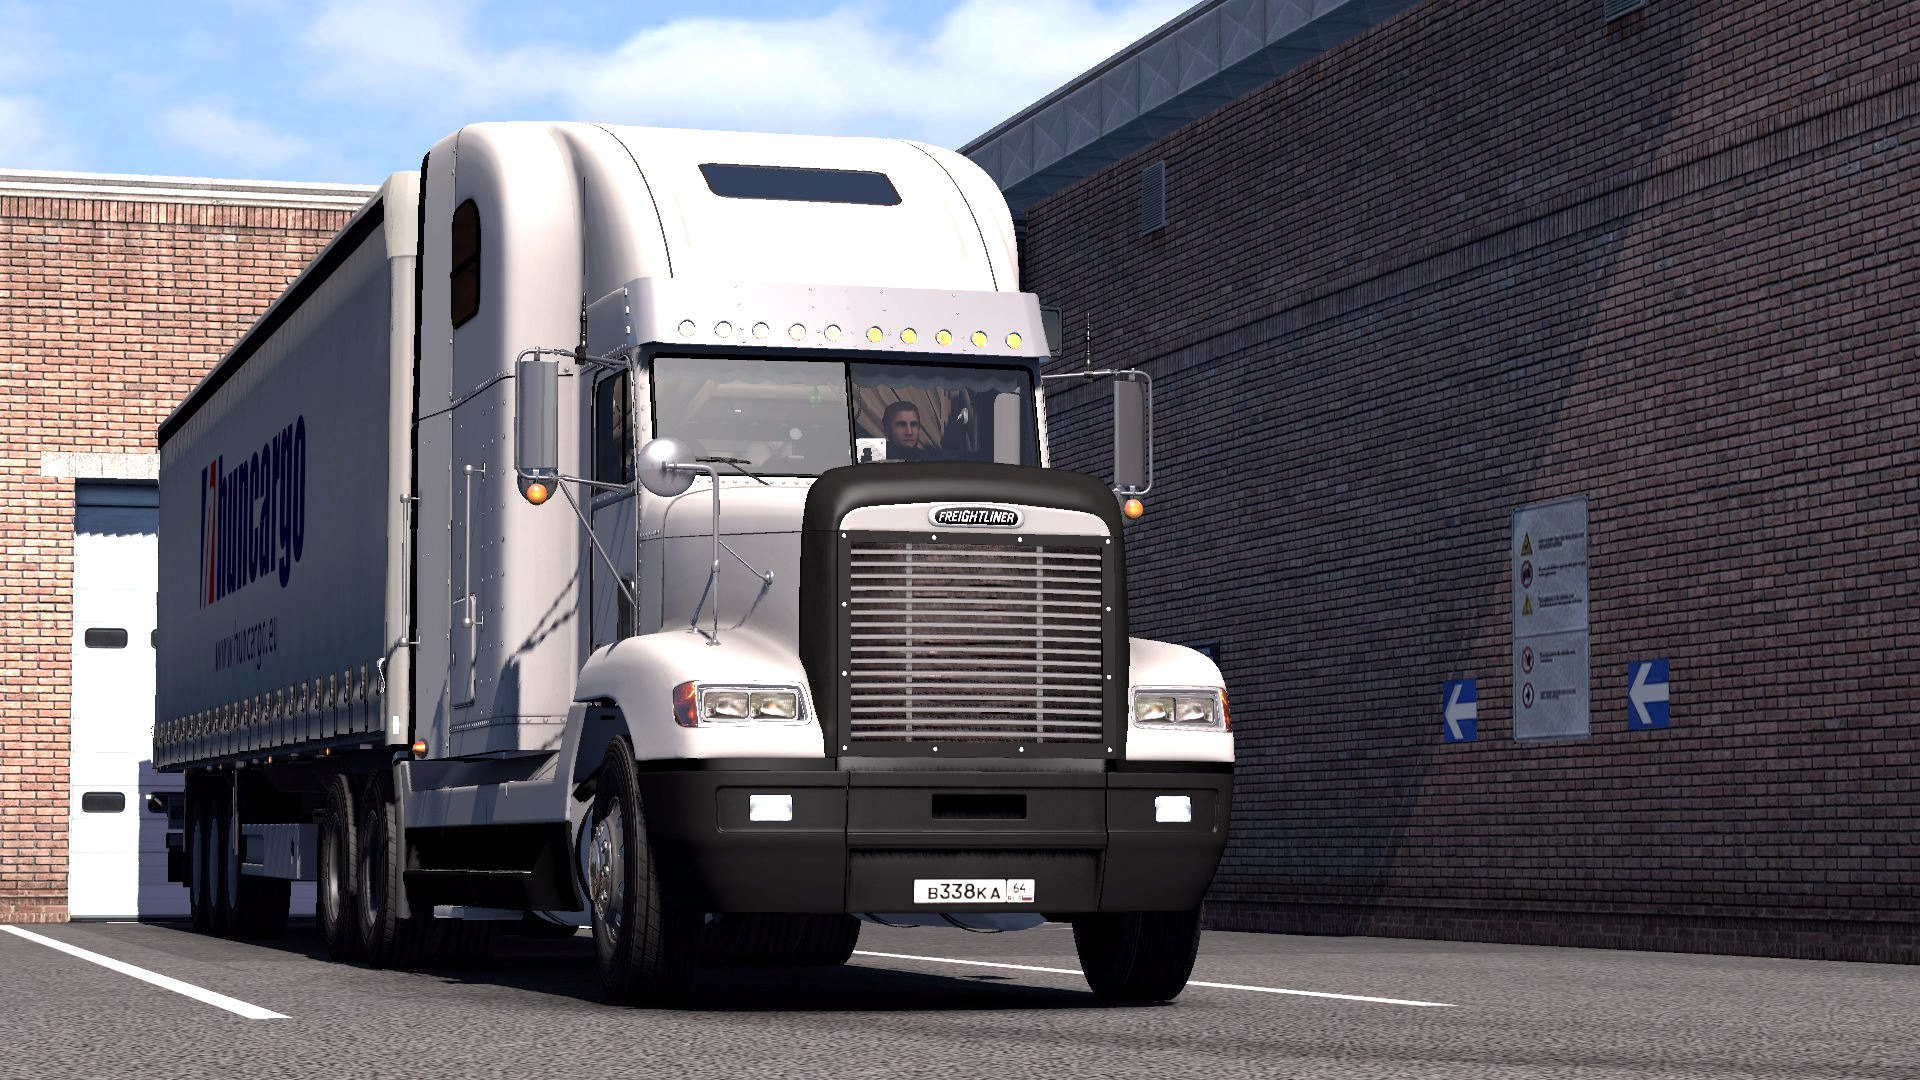 blkogGWDGAc.jpg - Euro Truck Simulator 2